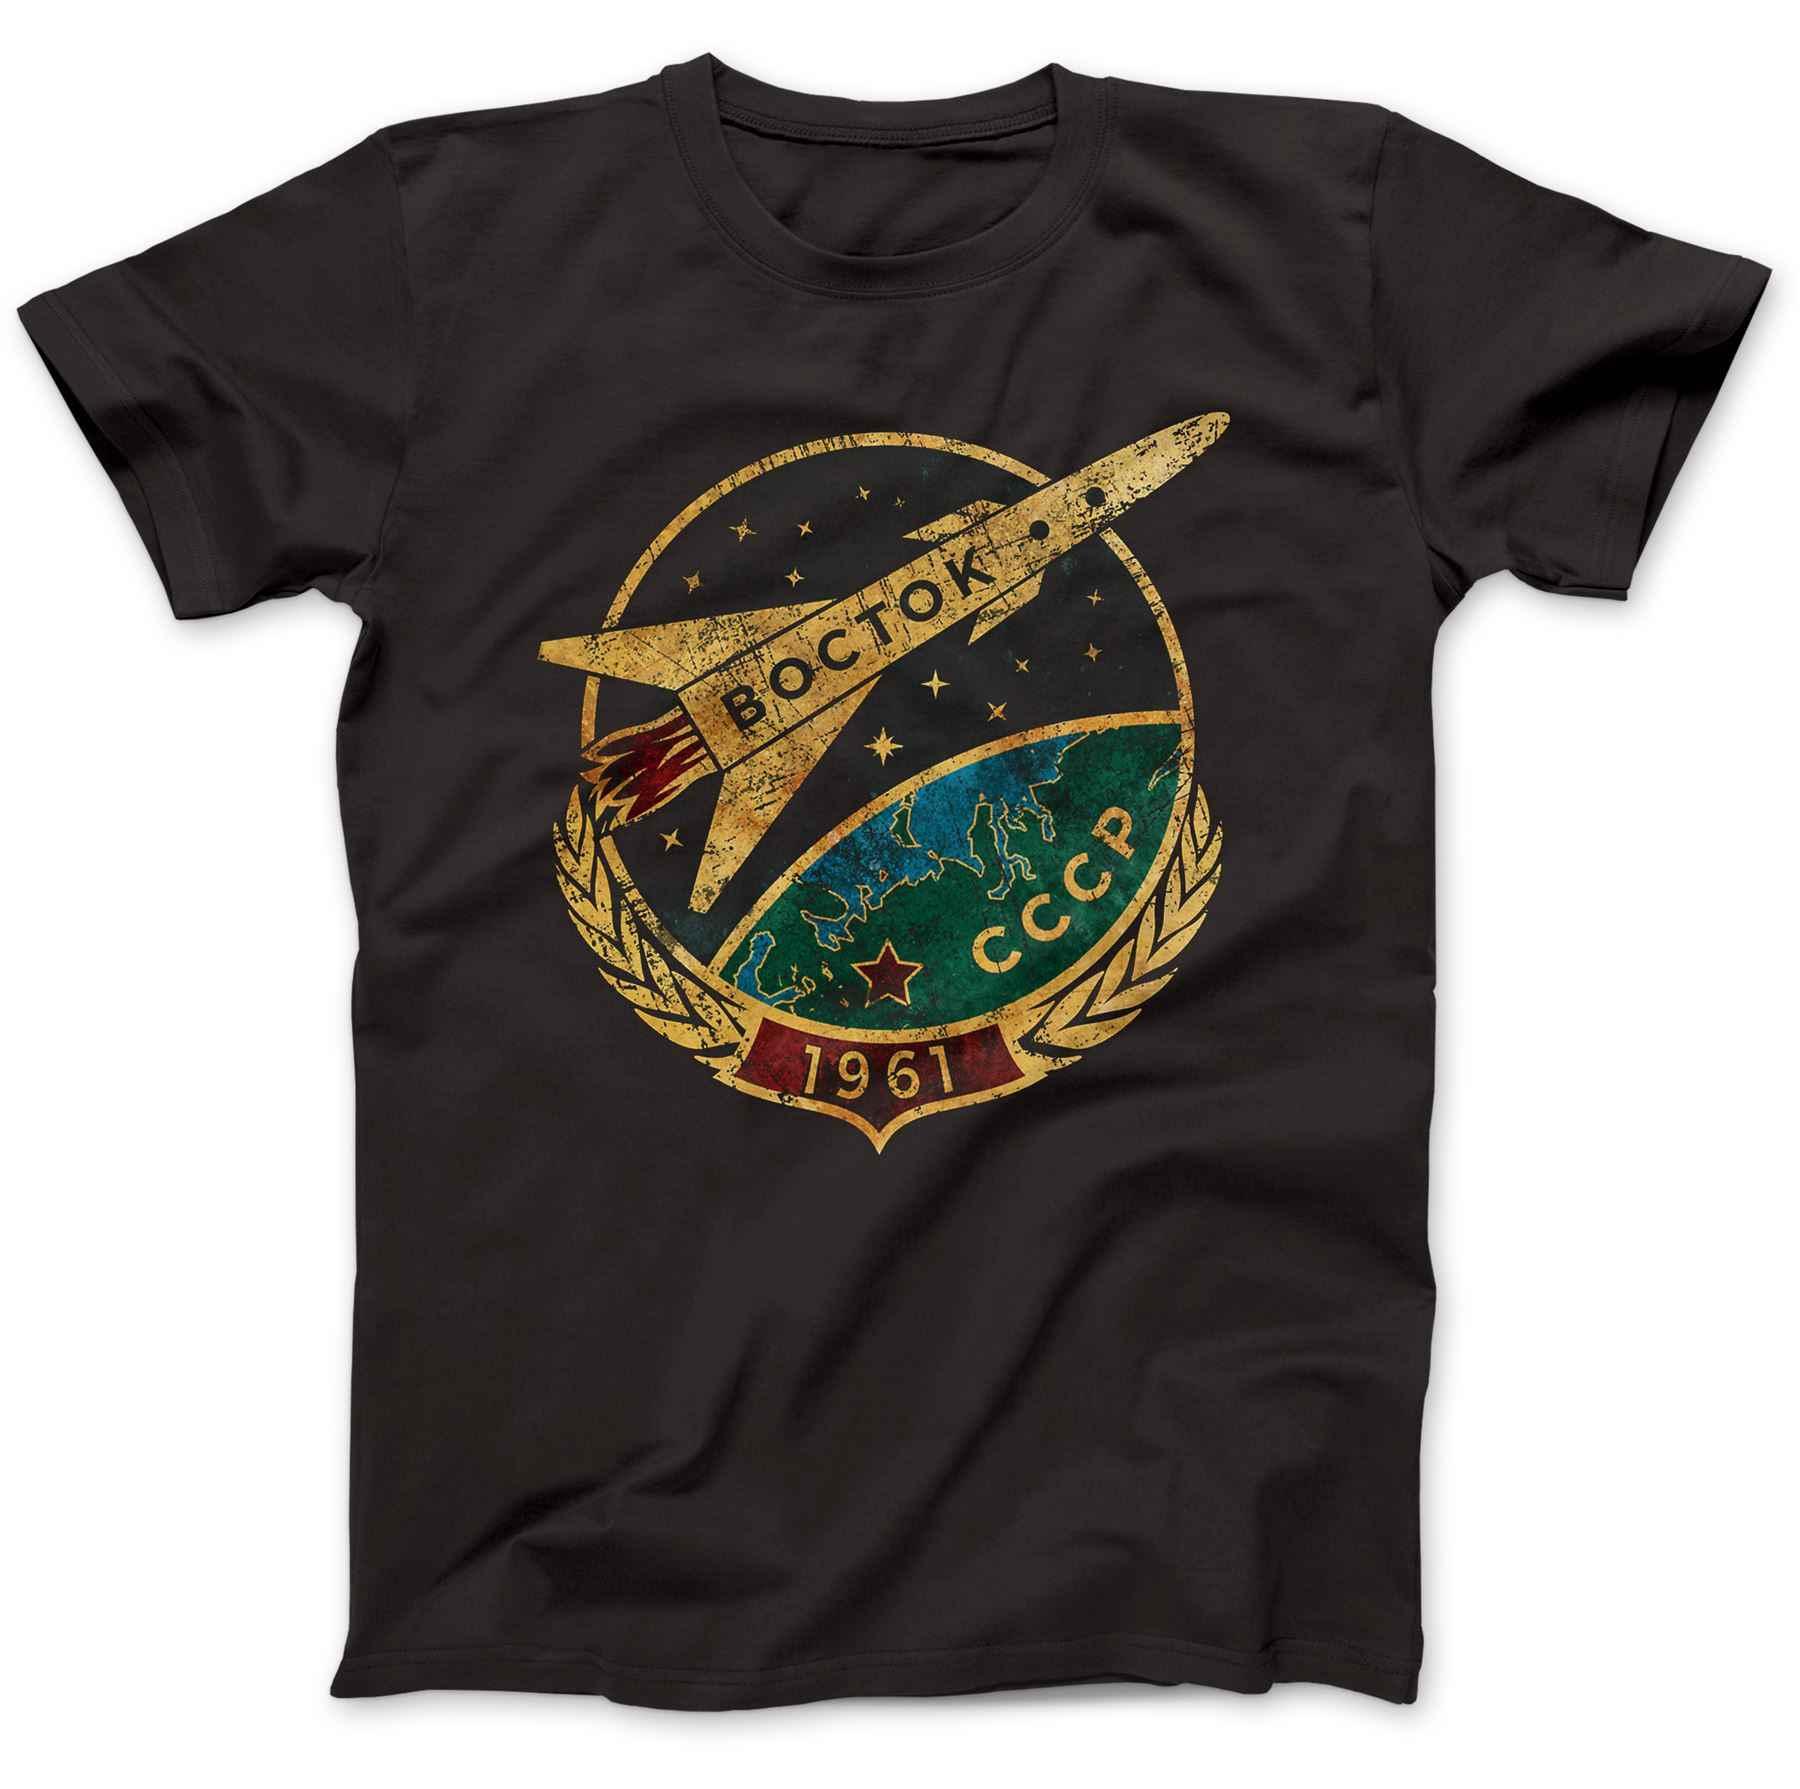 CCCP camiseta soviética 100% algodón Premium Rusia regalo presente Casual hombres camiseta